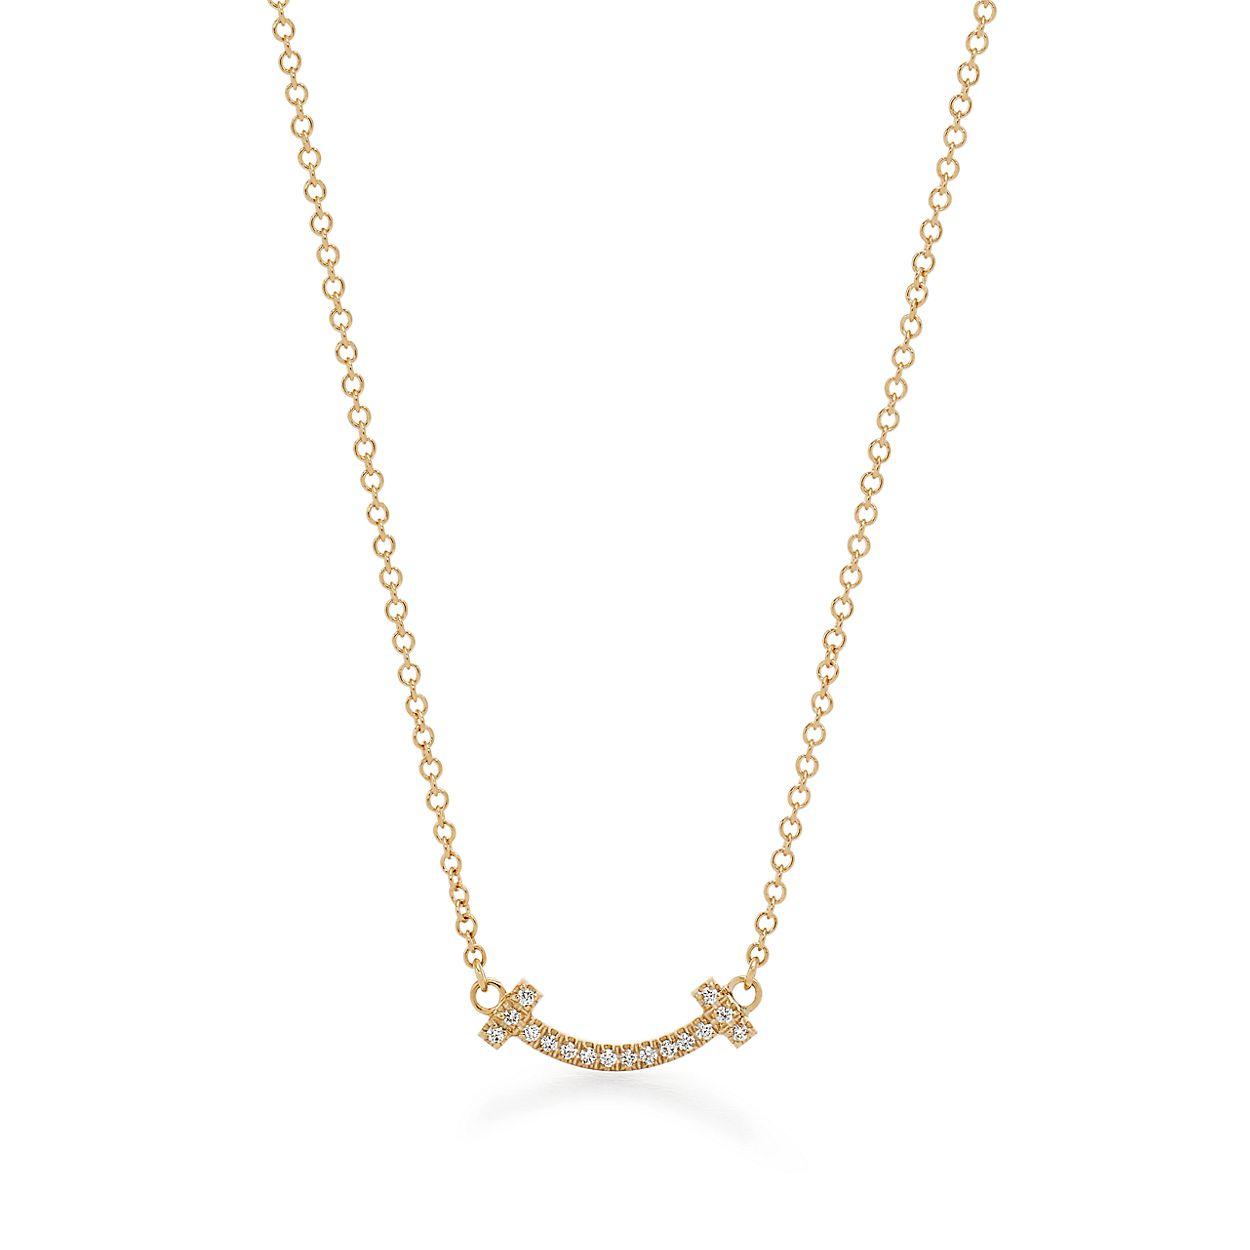 Pendente Smile Tiffany T em ouro 18k com diamantes, micro.   Tiffany ... f11590a0b4